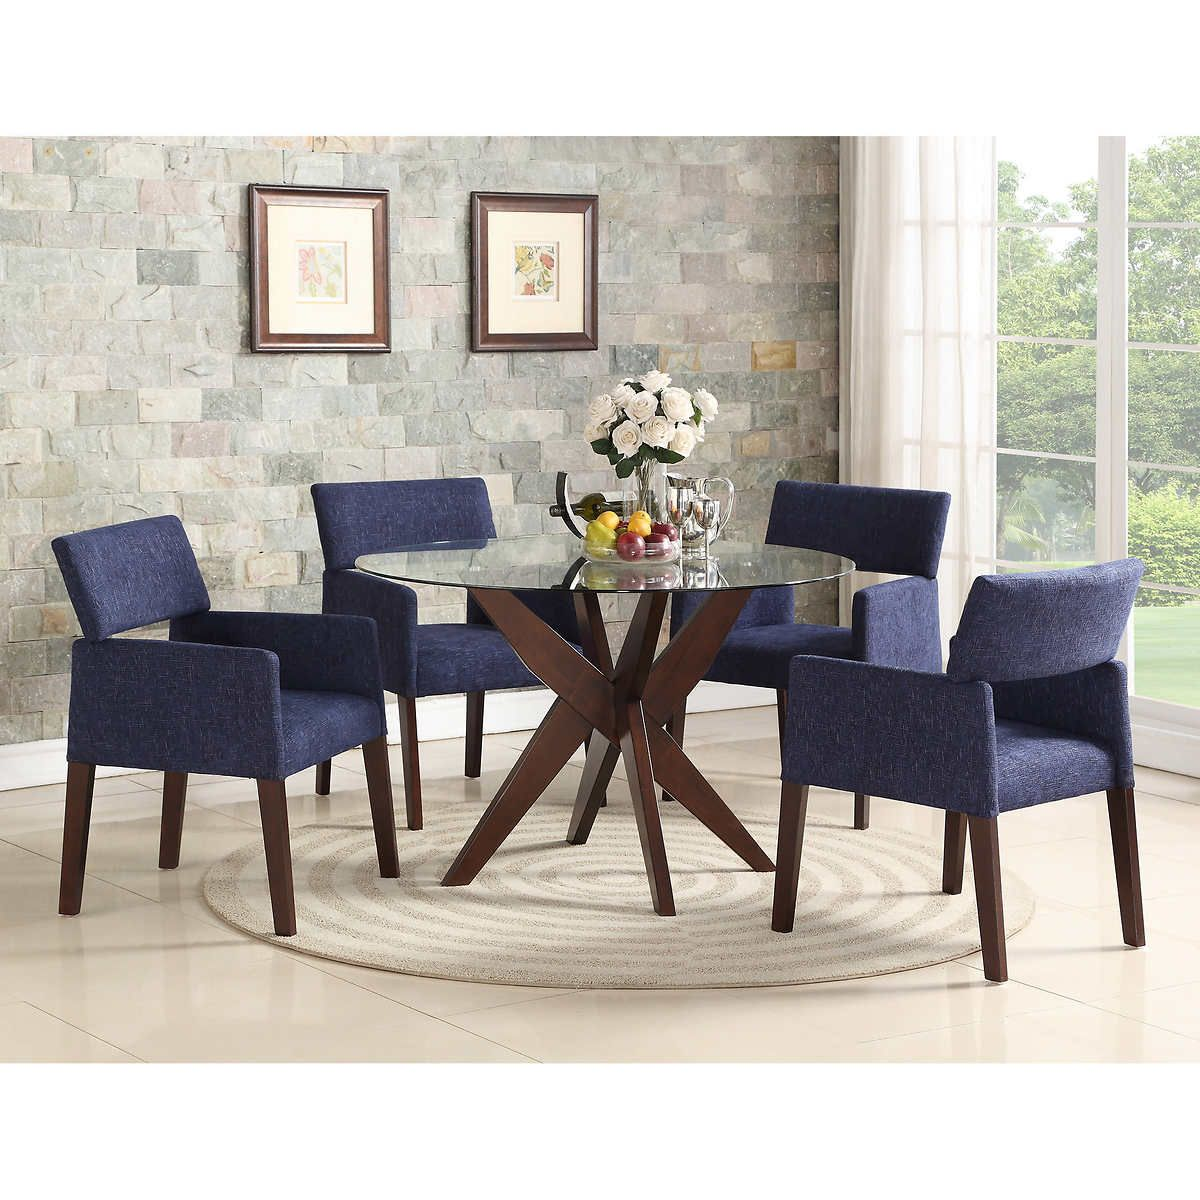 Savoye Dining Set   Dining table, Dining, Dining set